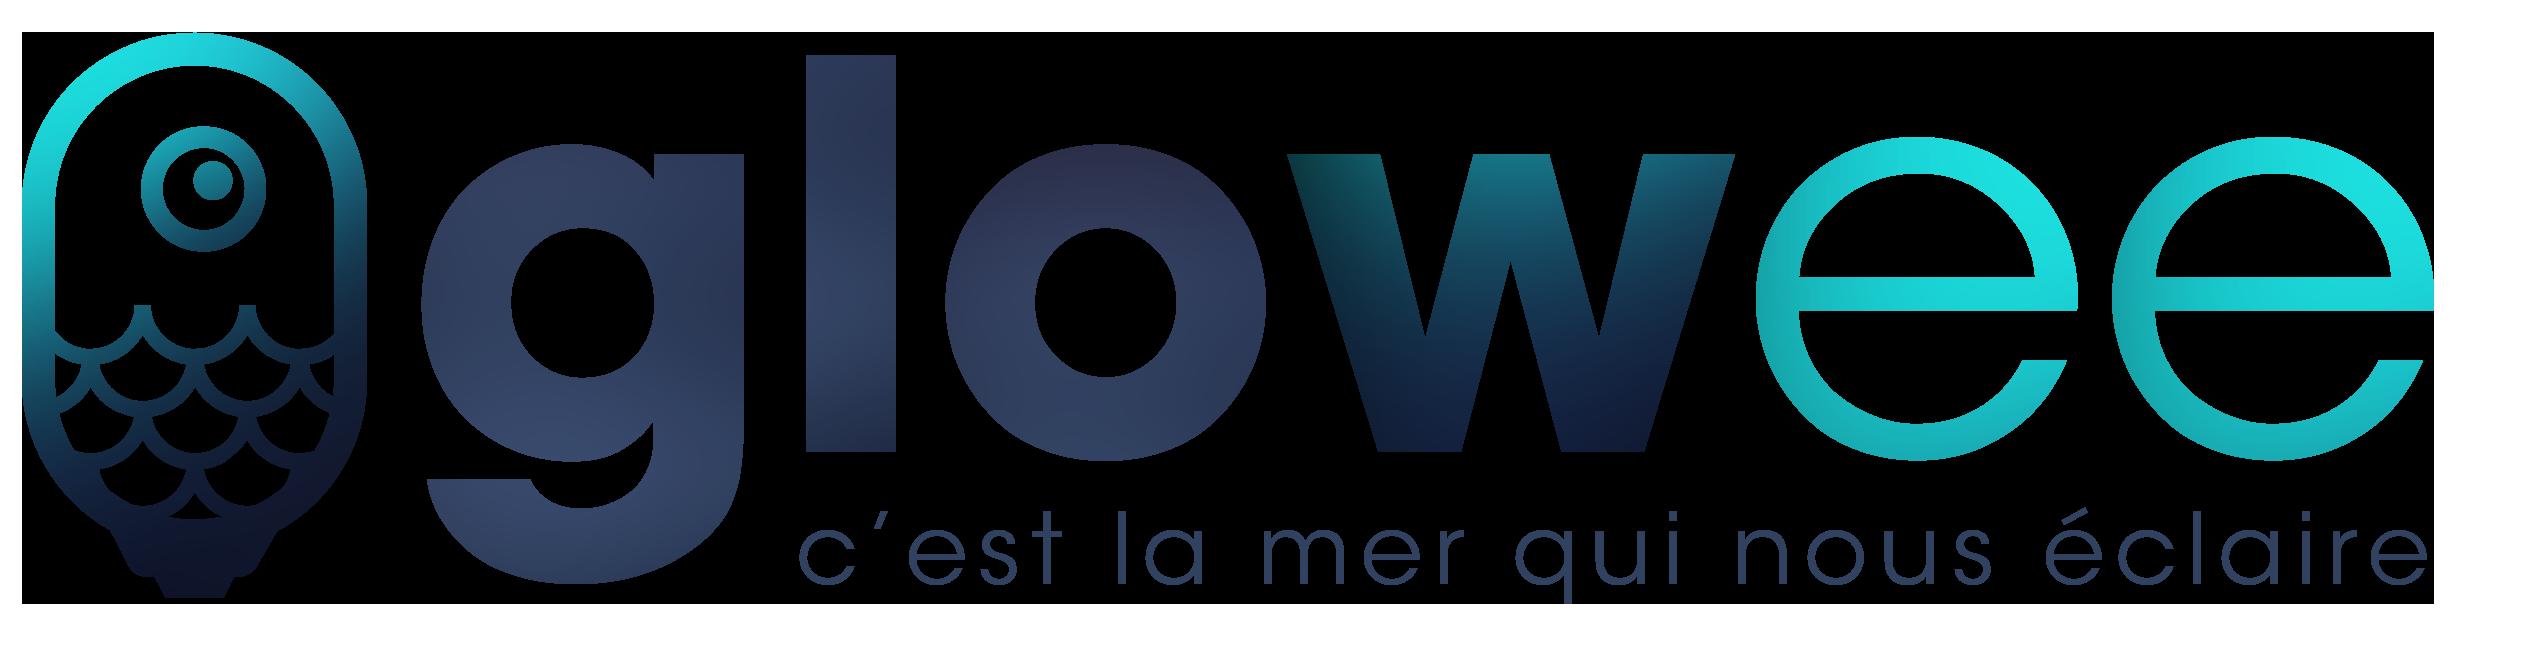 LogoFrCouleur